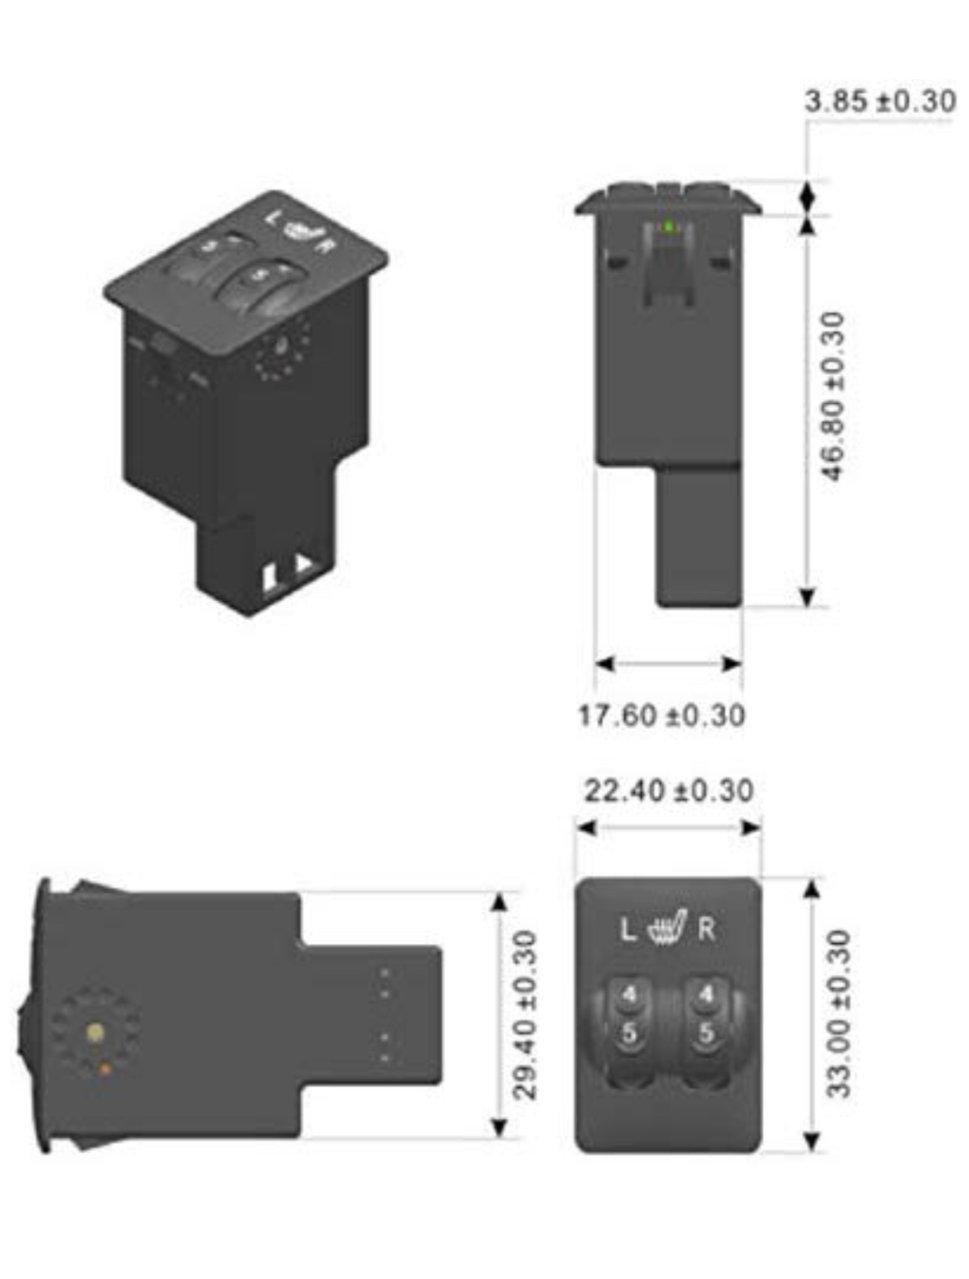 C564B26E-C3BE-45C9-BD70-2497A0D4FA94.jpg